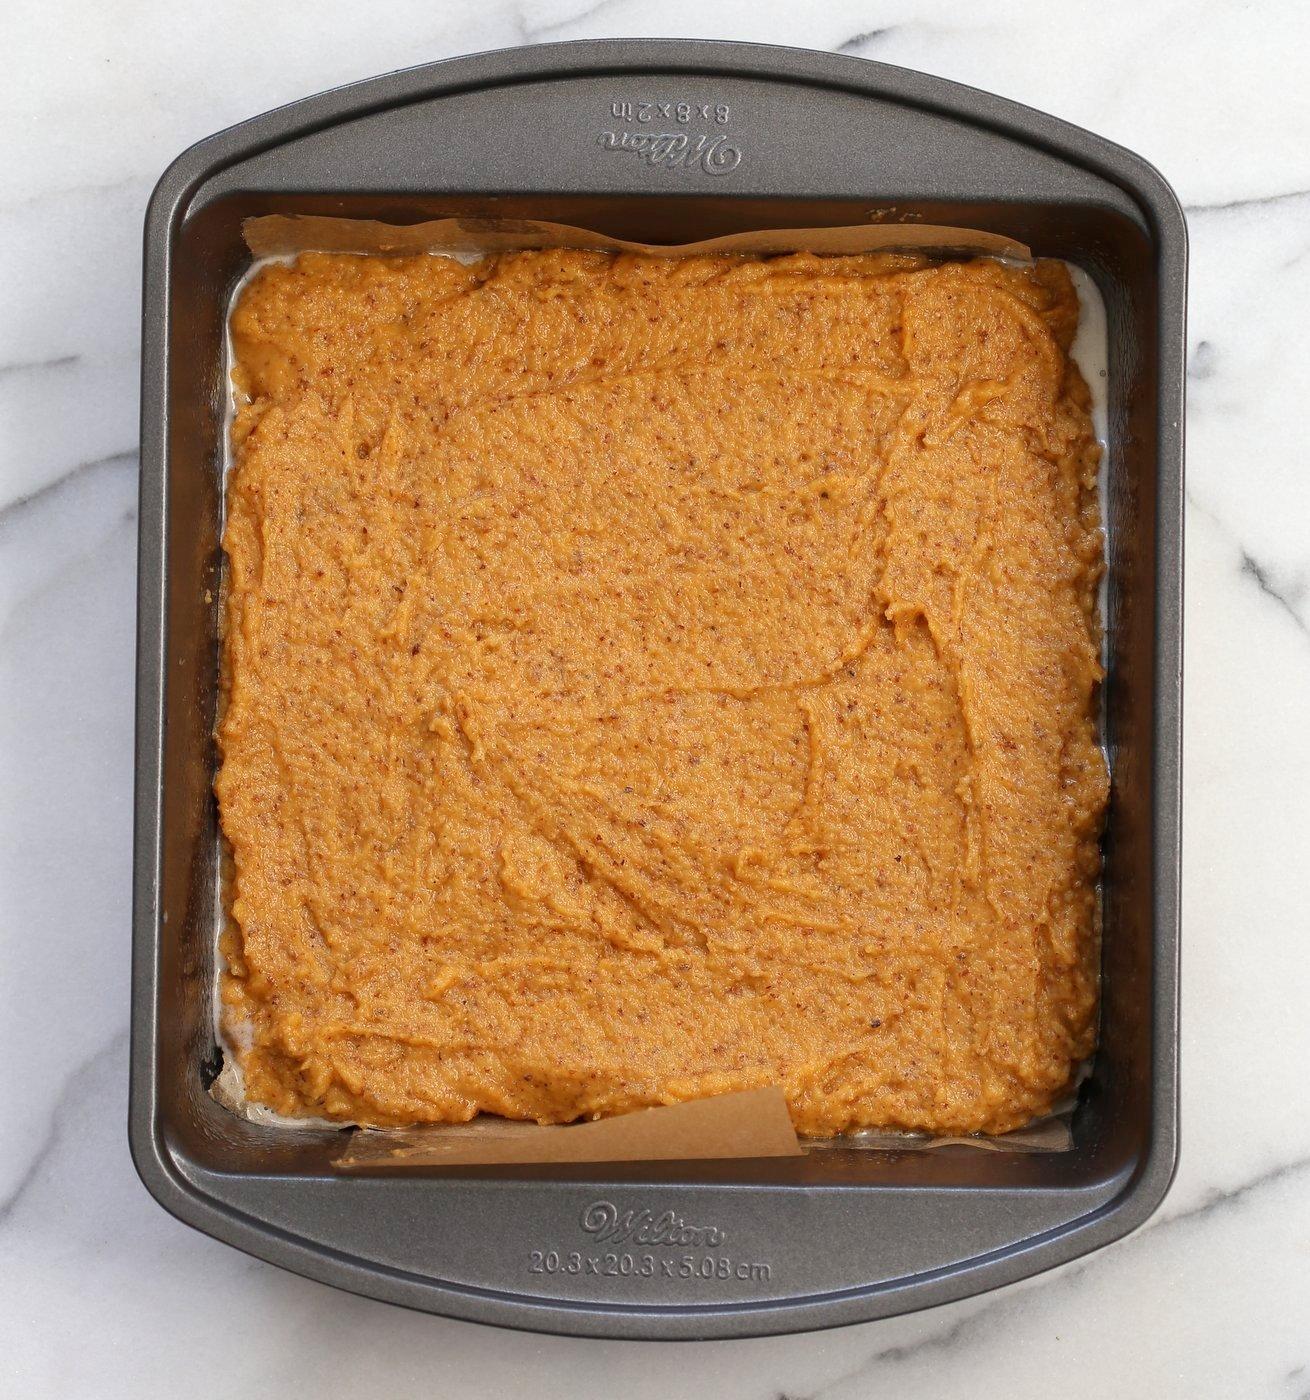 Vegan Gluten free Coffee Cake - Simple Fall Sweet Potato Pecan Crumb Cake with Pumpkin pie spices. Warm Cozy slice of cake. Gluten-free Soy-free Recipe. | VeganRicha.com